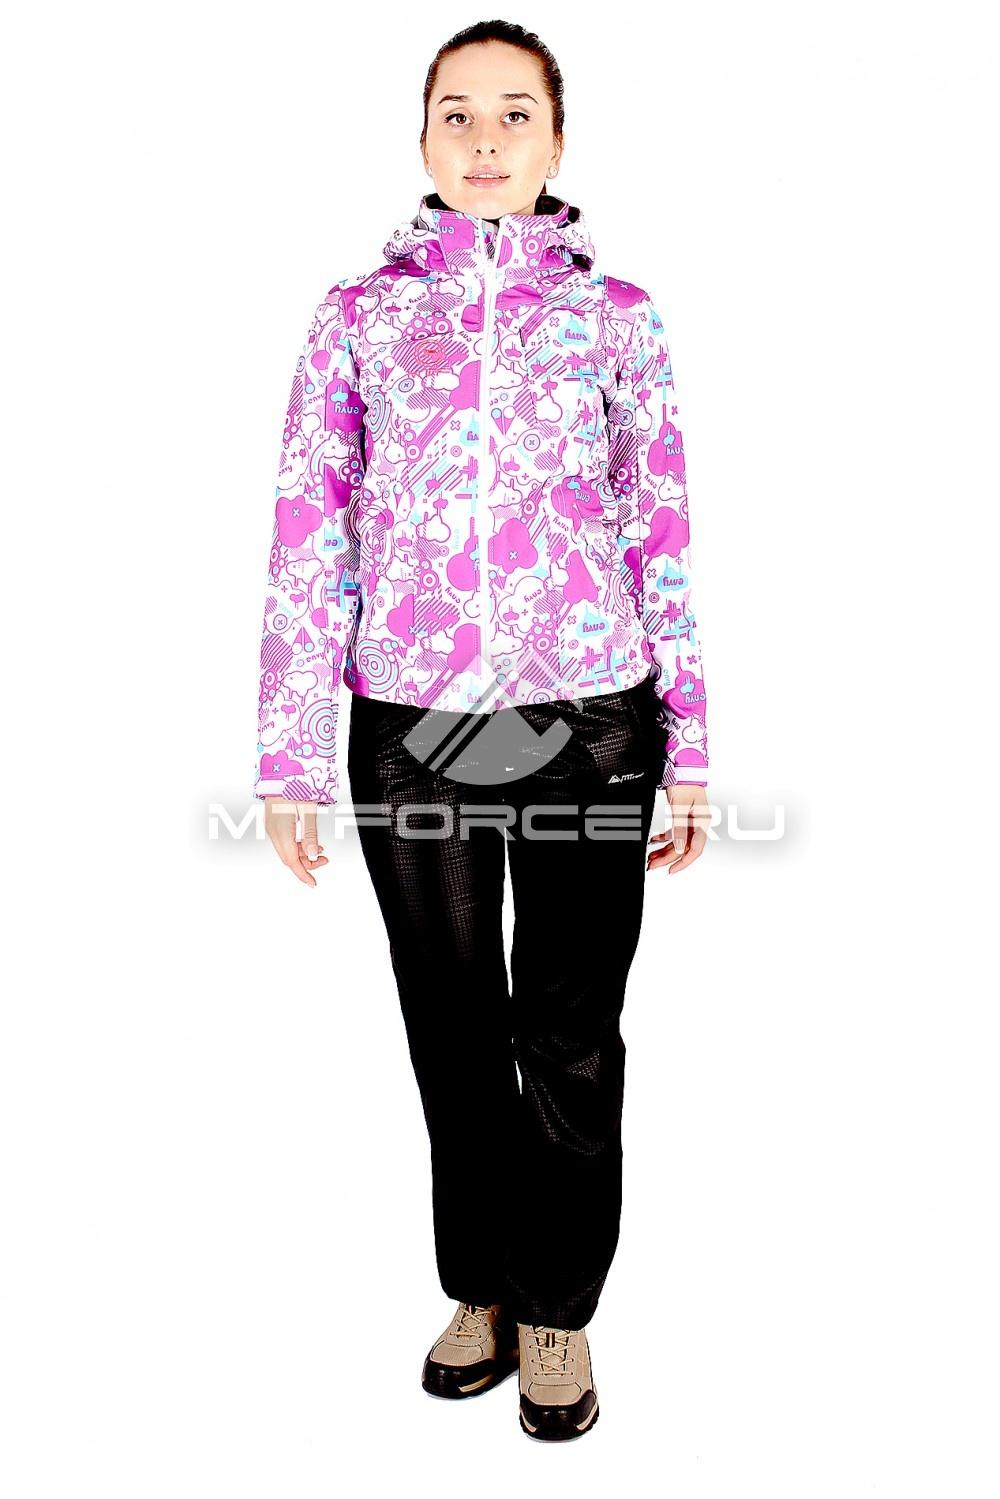 Купить                                  оптом Костюм виндстопер женский розового цвета 01512R в Санкт-Петербурге